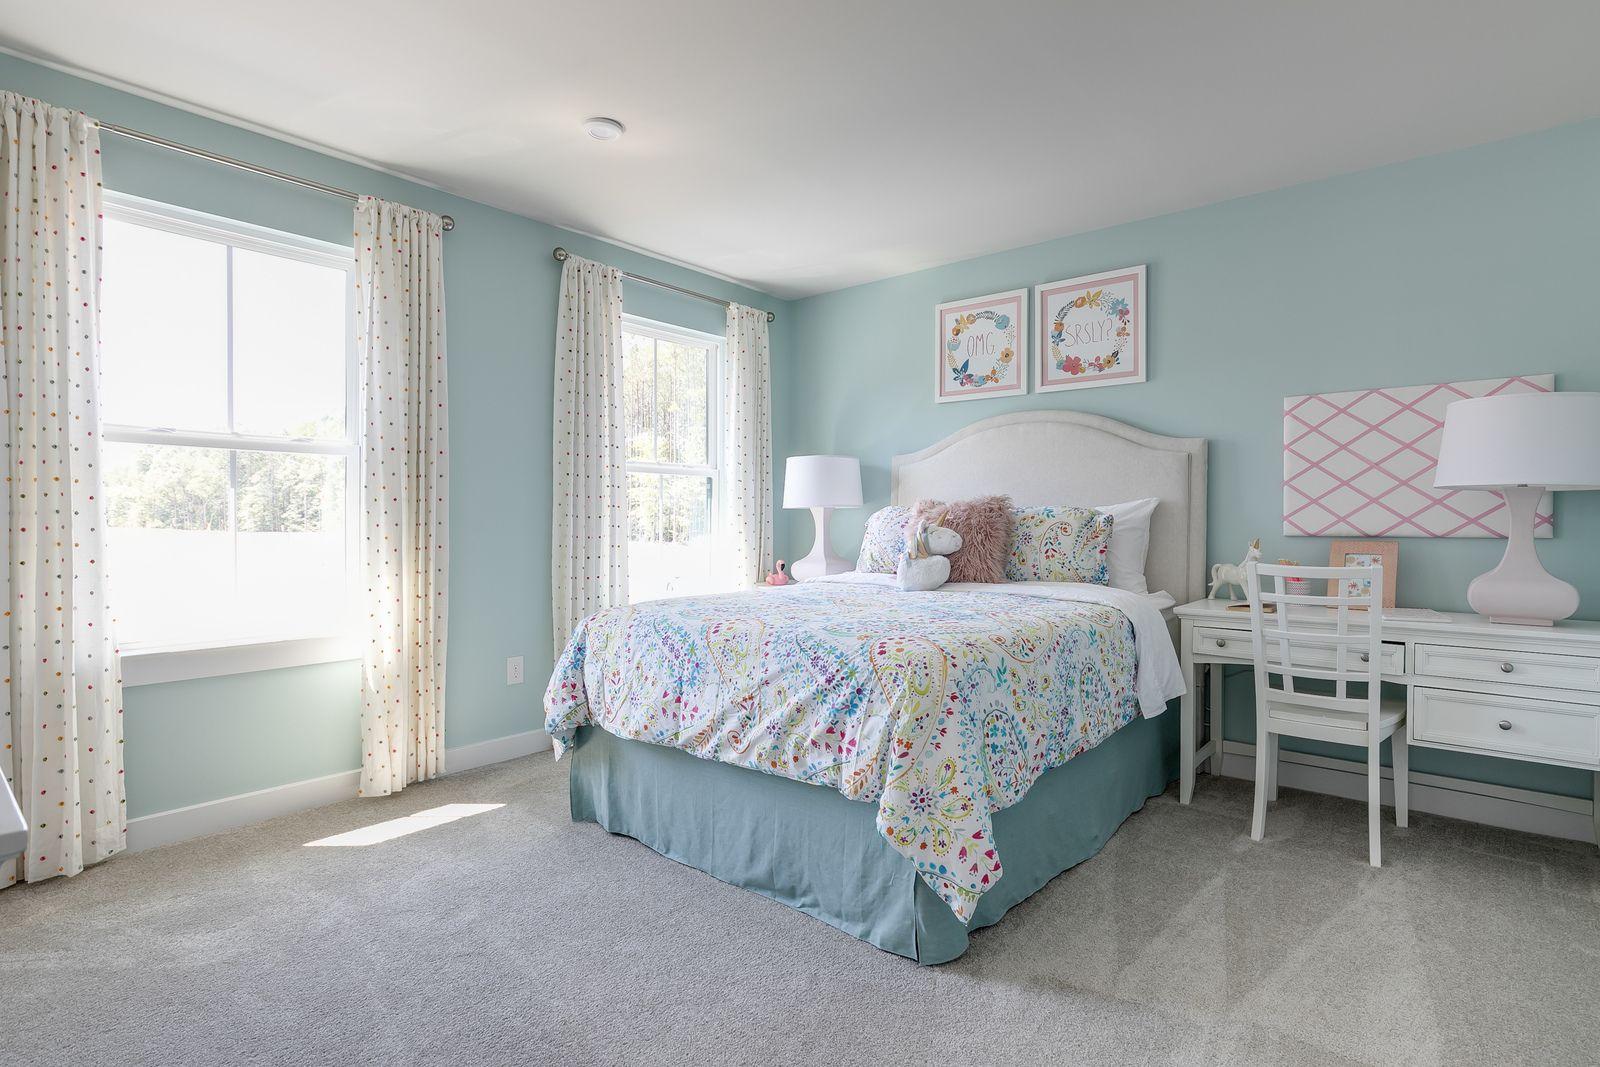 Bedroom featured in the Seneca at Hartland By Ryan Homes in Washington, VA